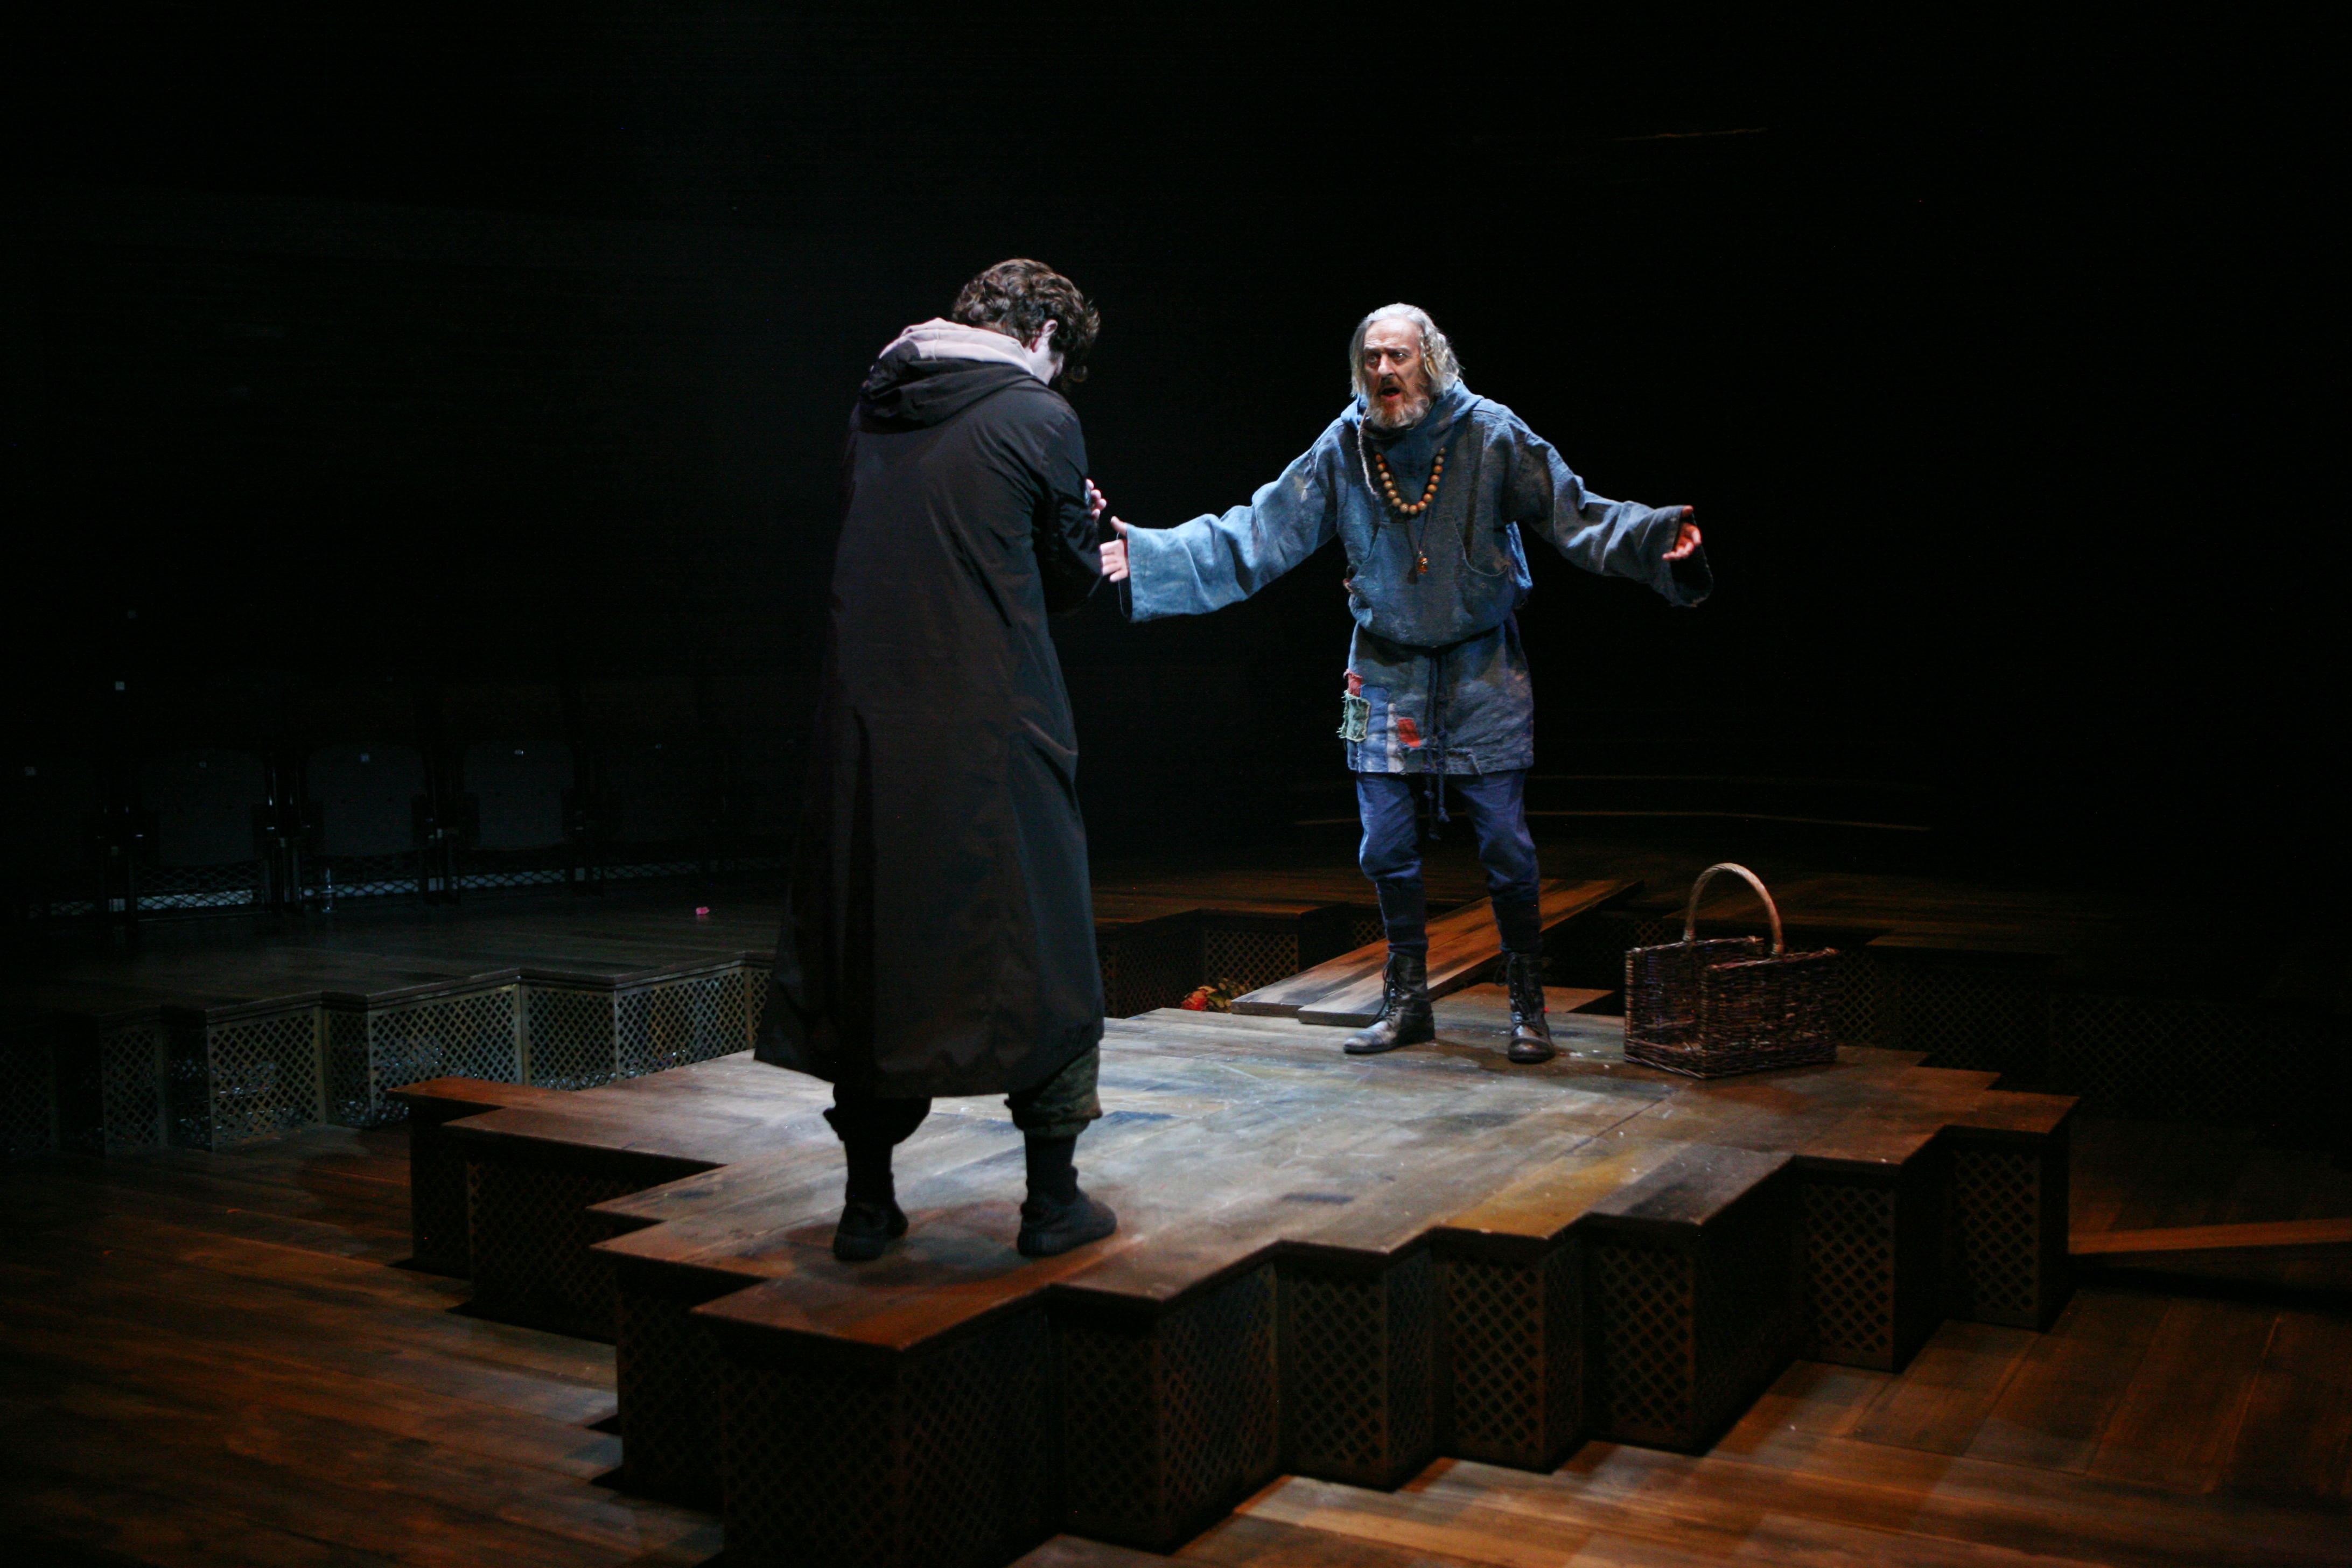 George Caple & Richard Bremmer in Romeo & Juliet, photo by Gary Calton GC280517108